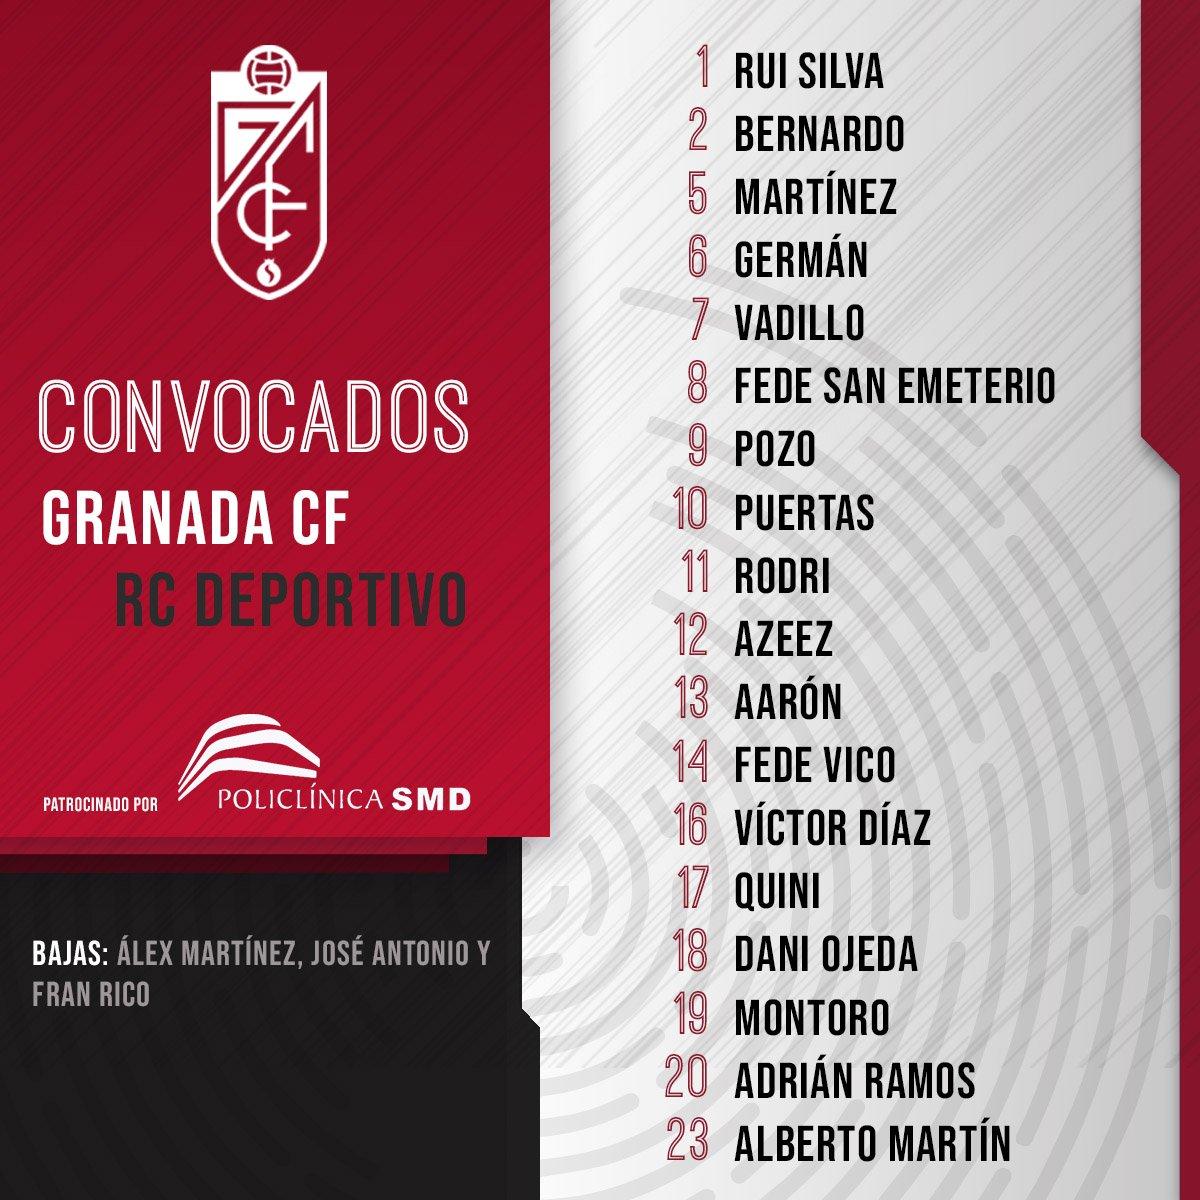 Convocatoria del Granada CF (Foto: Granada CF).